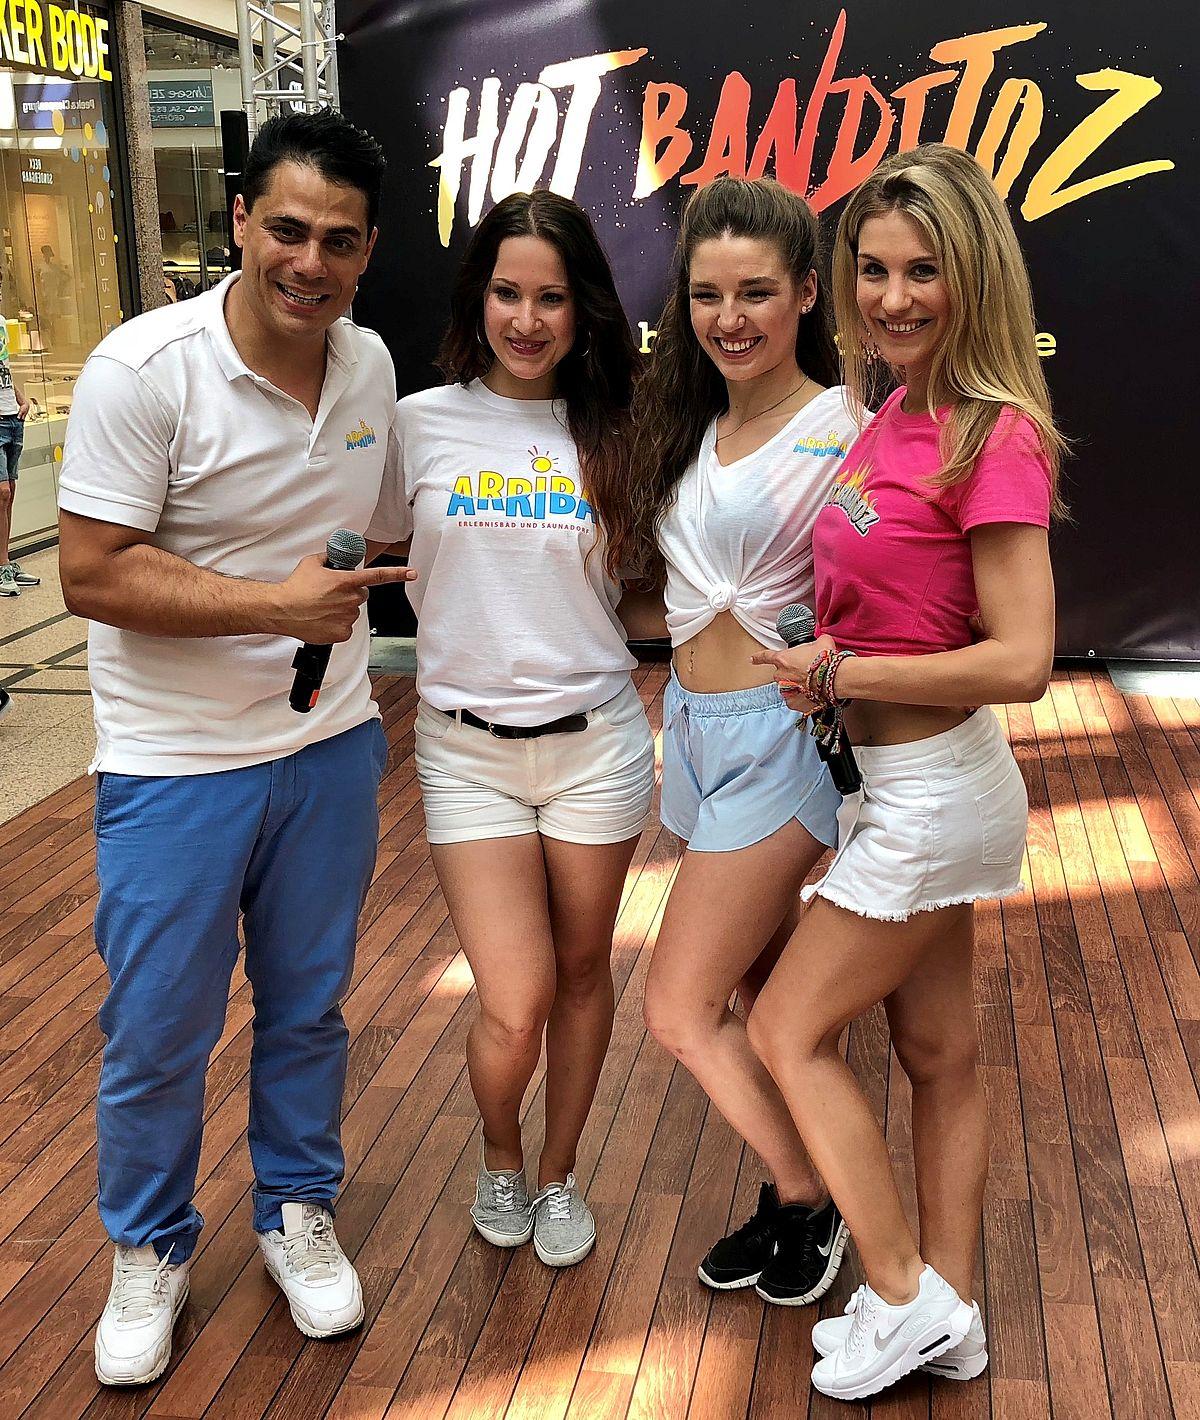 Silva Gonzalez, Melissa Smolka, Franziska Wagner, Stefanie Schanzleh